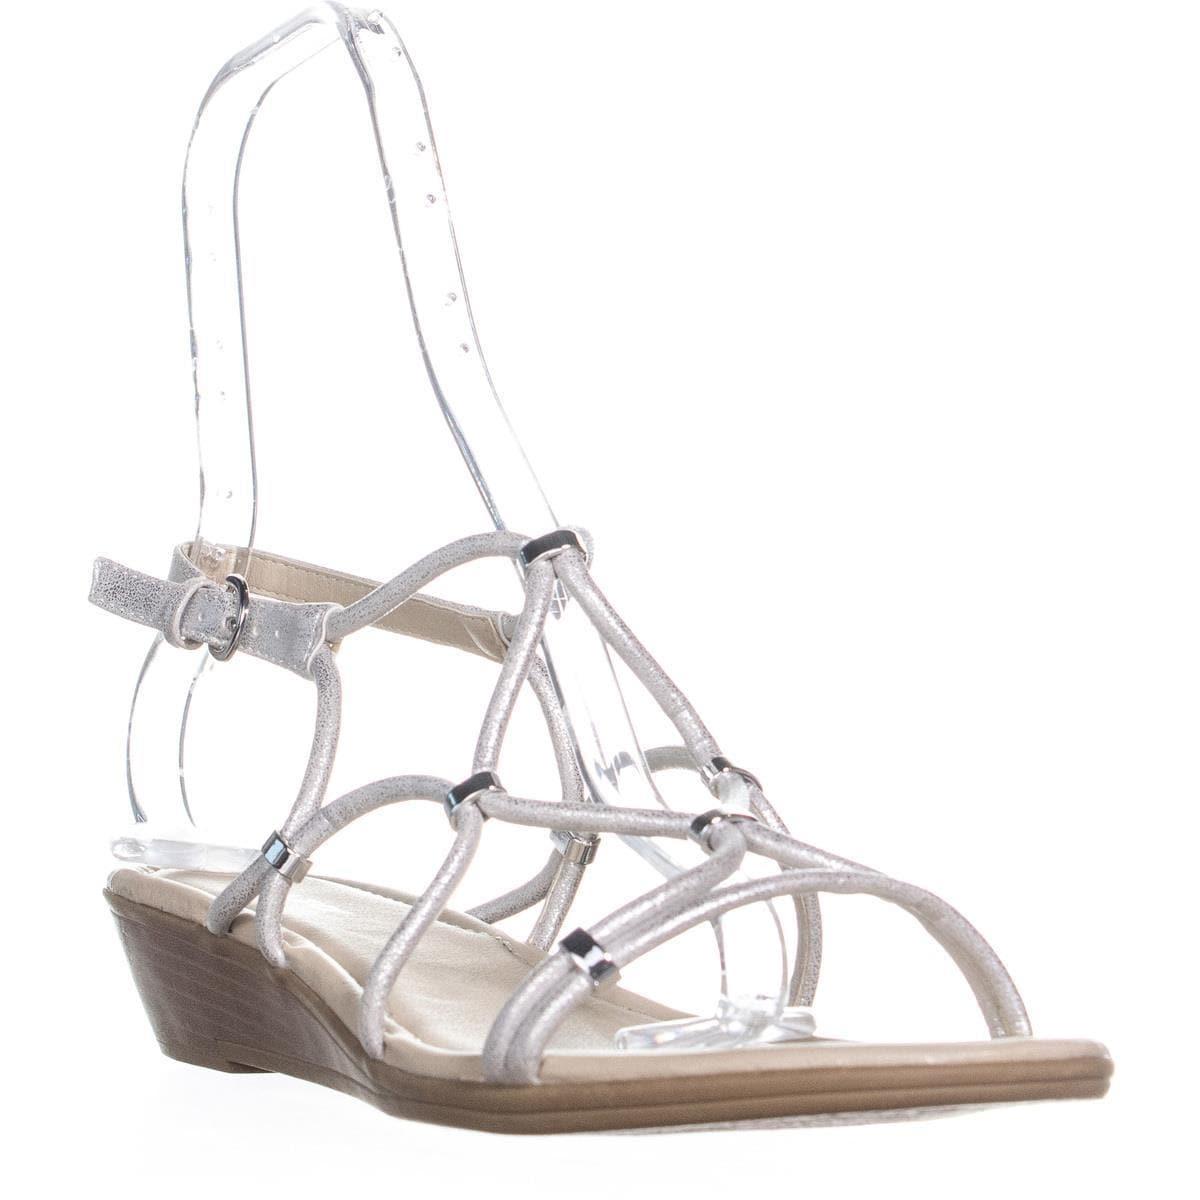 42c69e124 Shop Rialto Gillian Low Wedge Strap Sandals